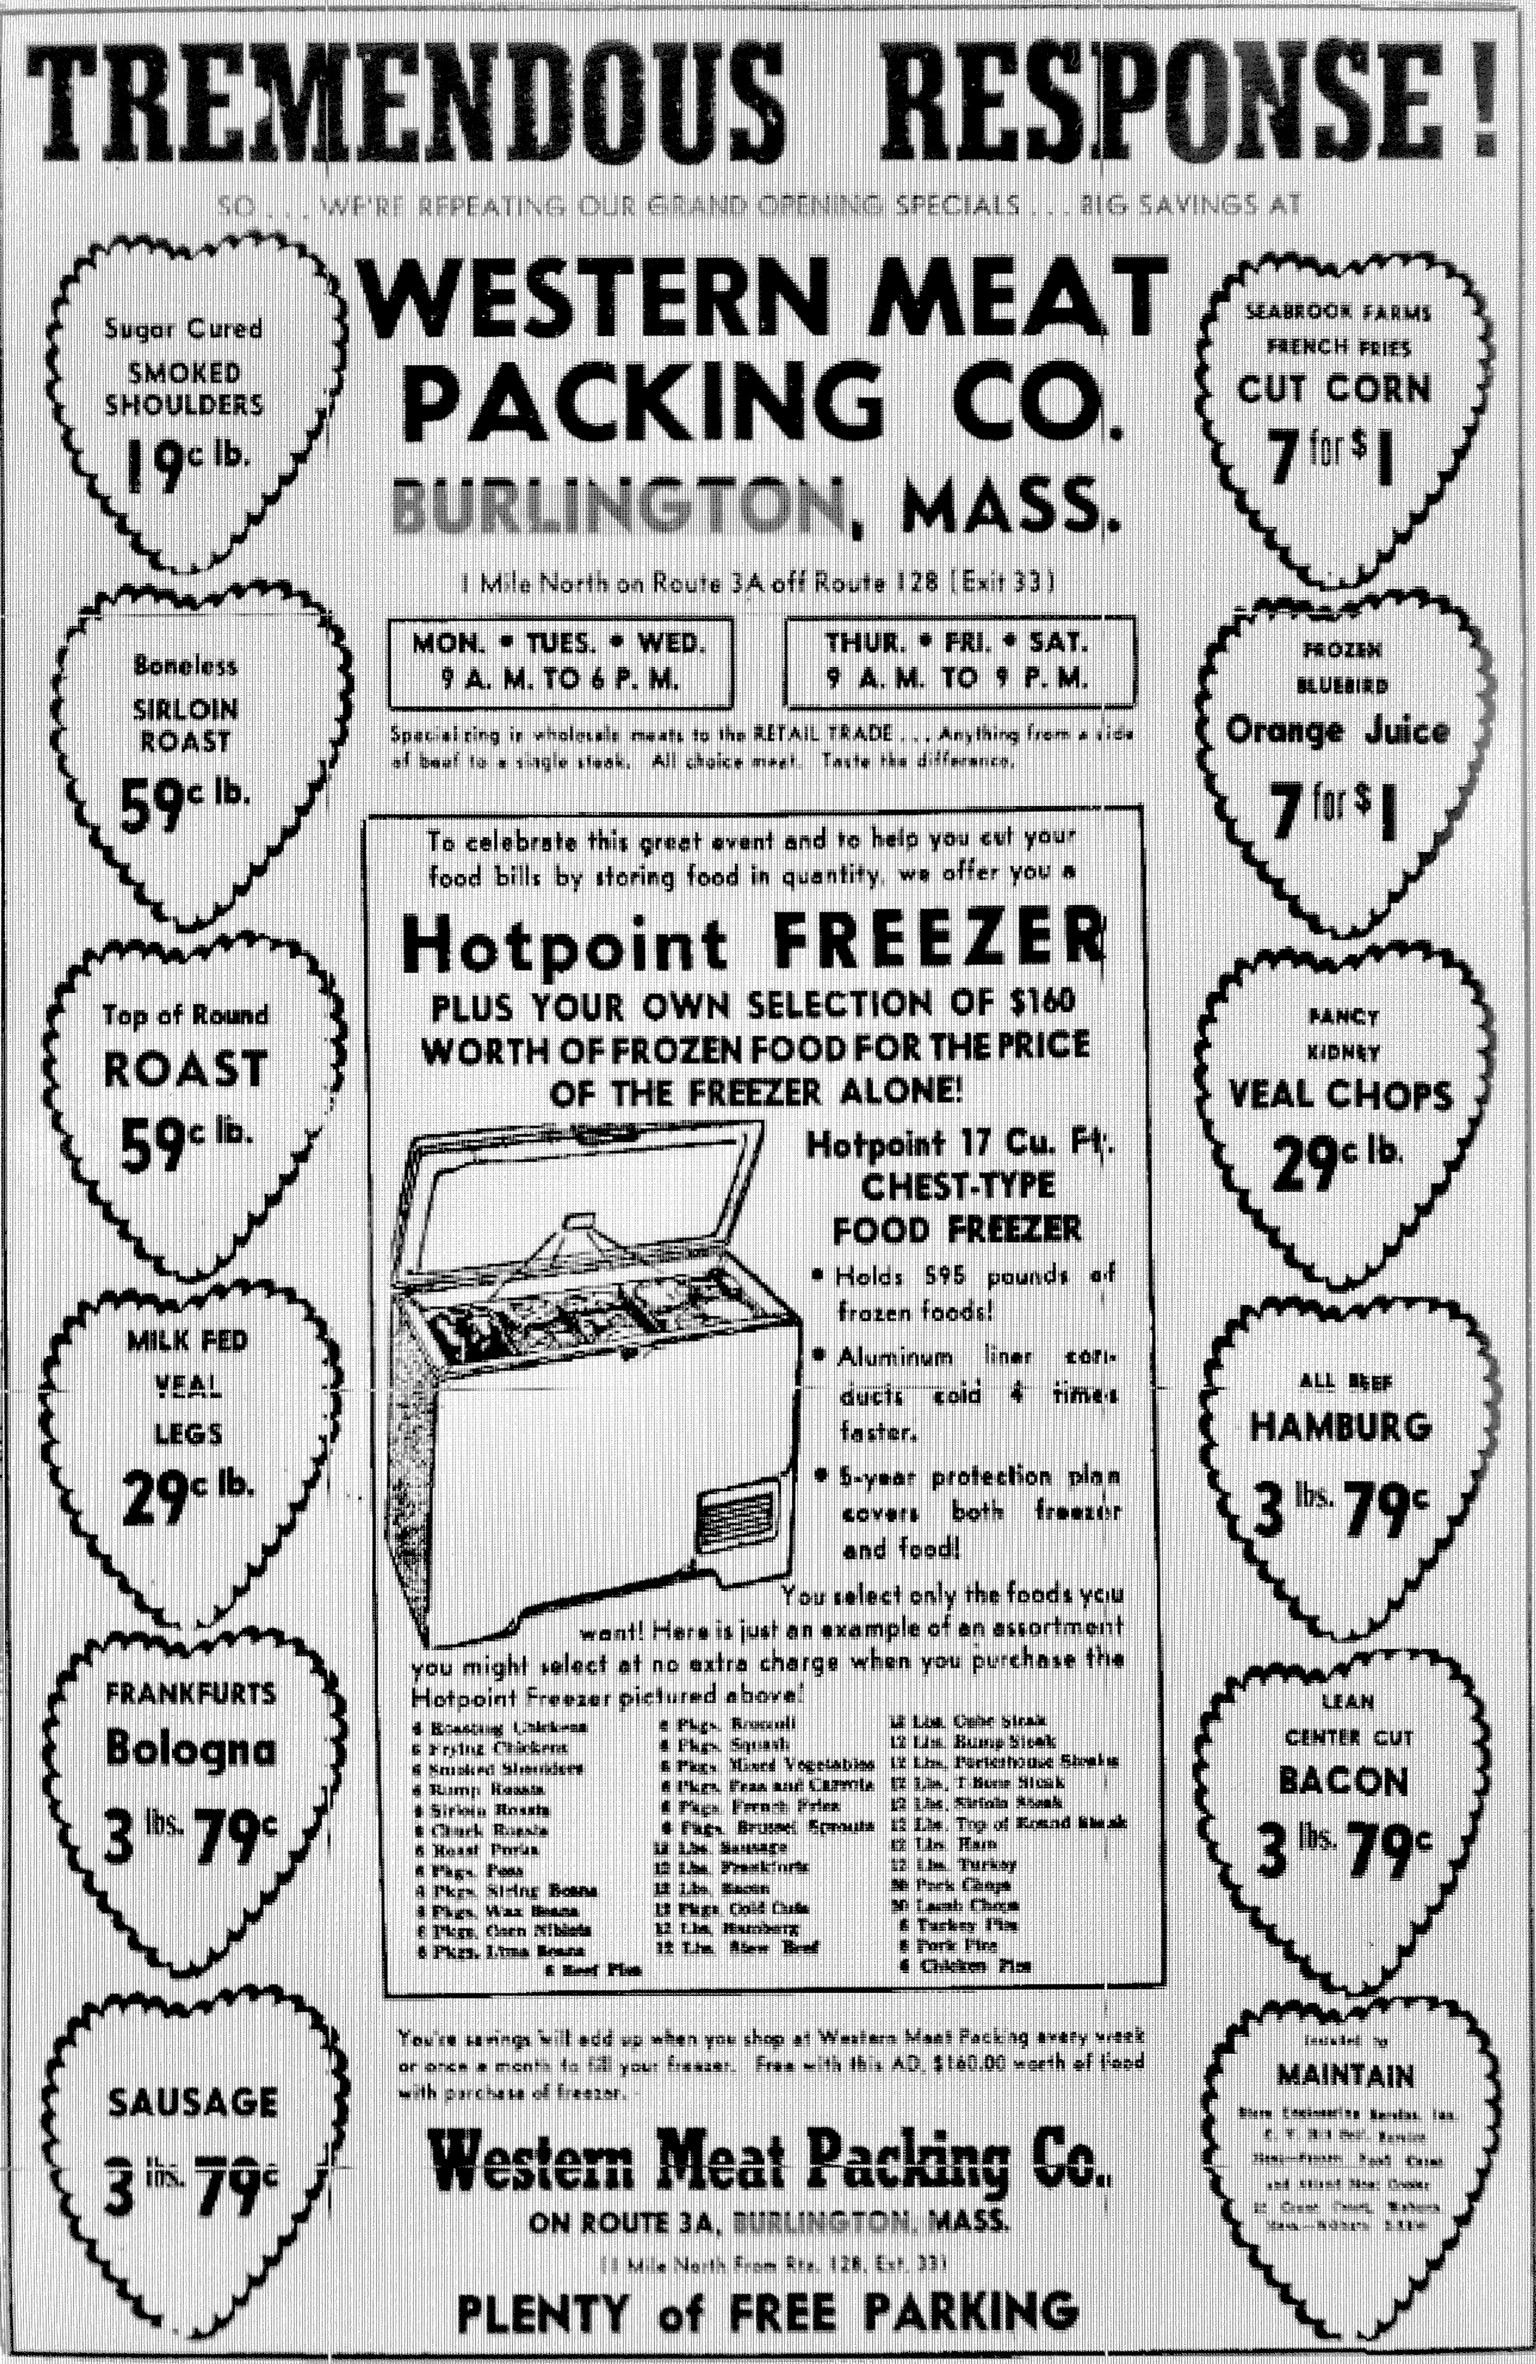 Western Meat Packing Co., 1956 ad Burlington MA